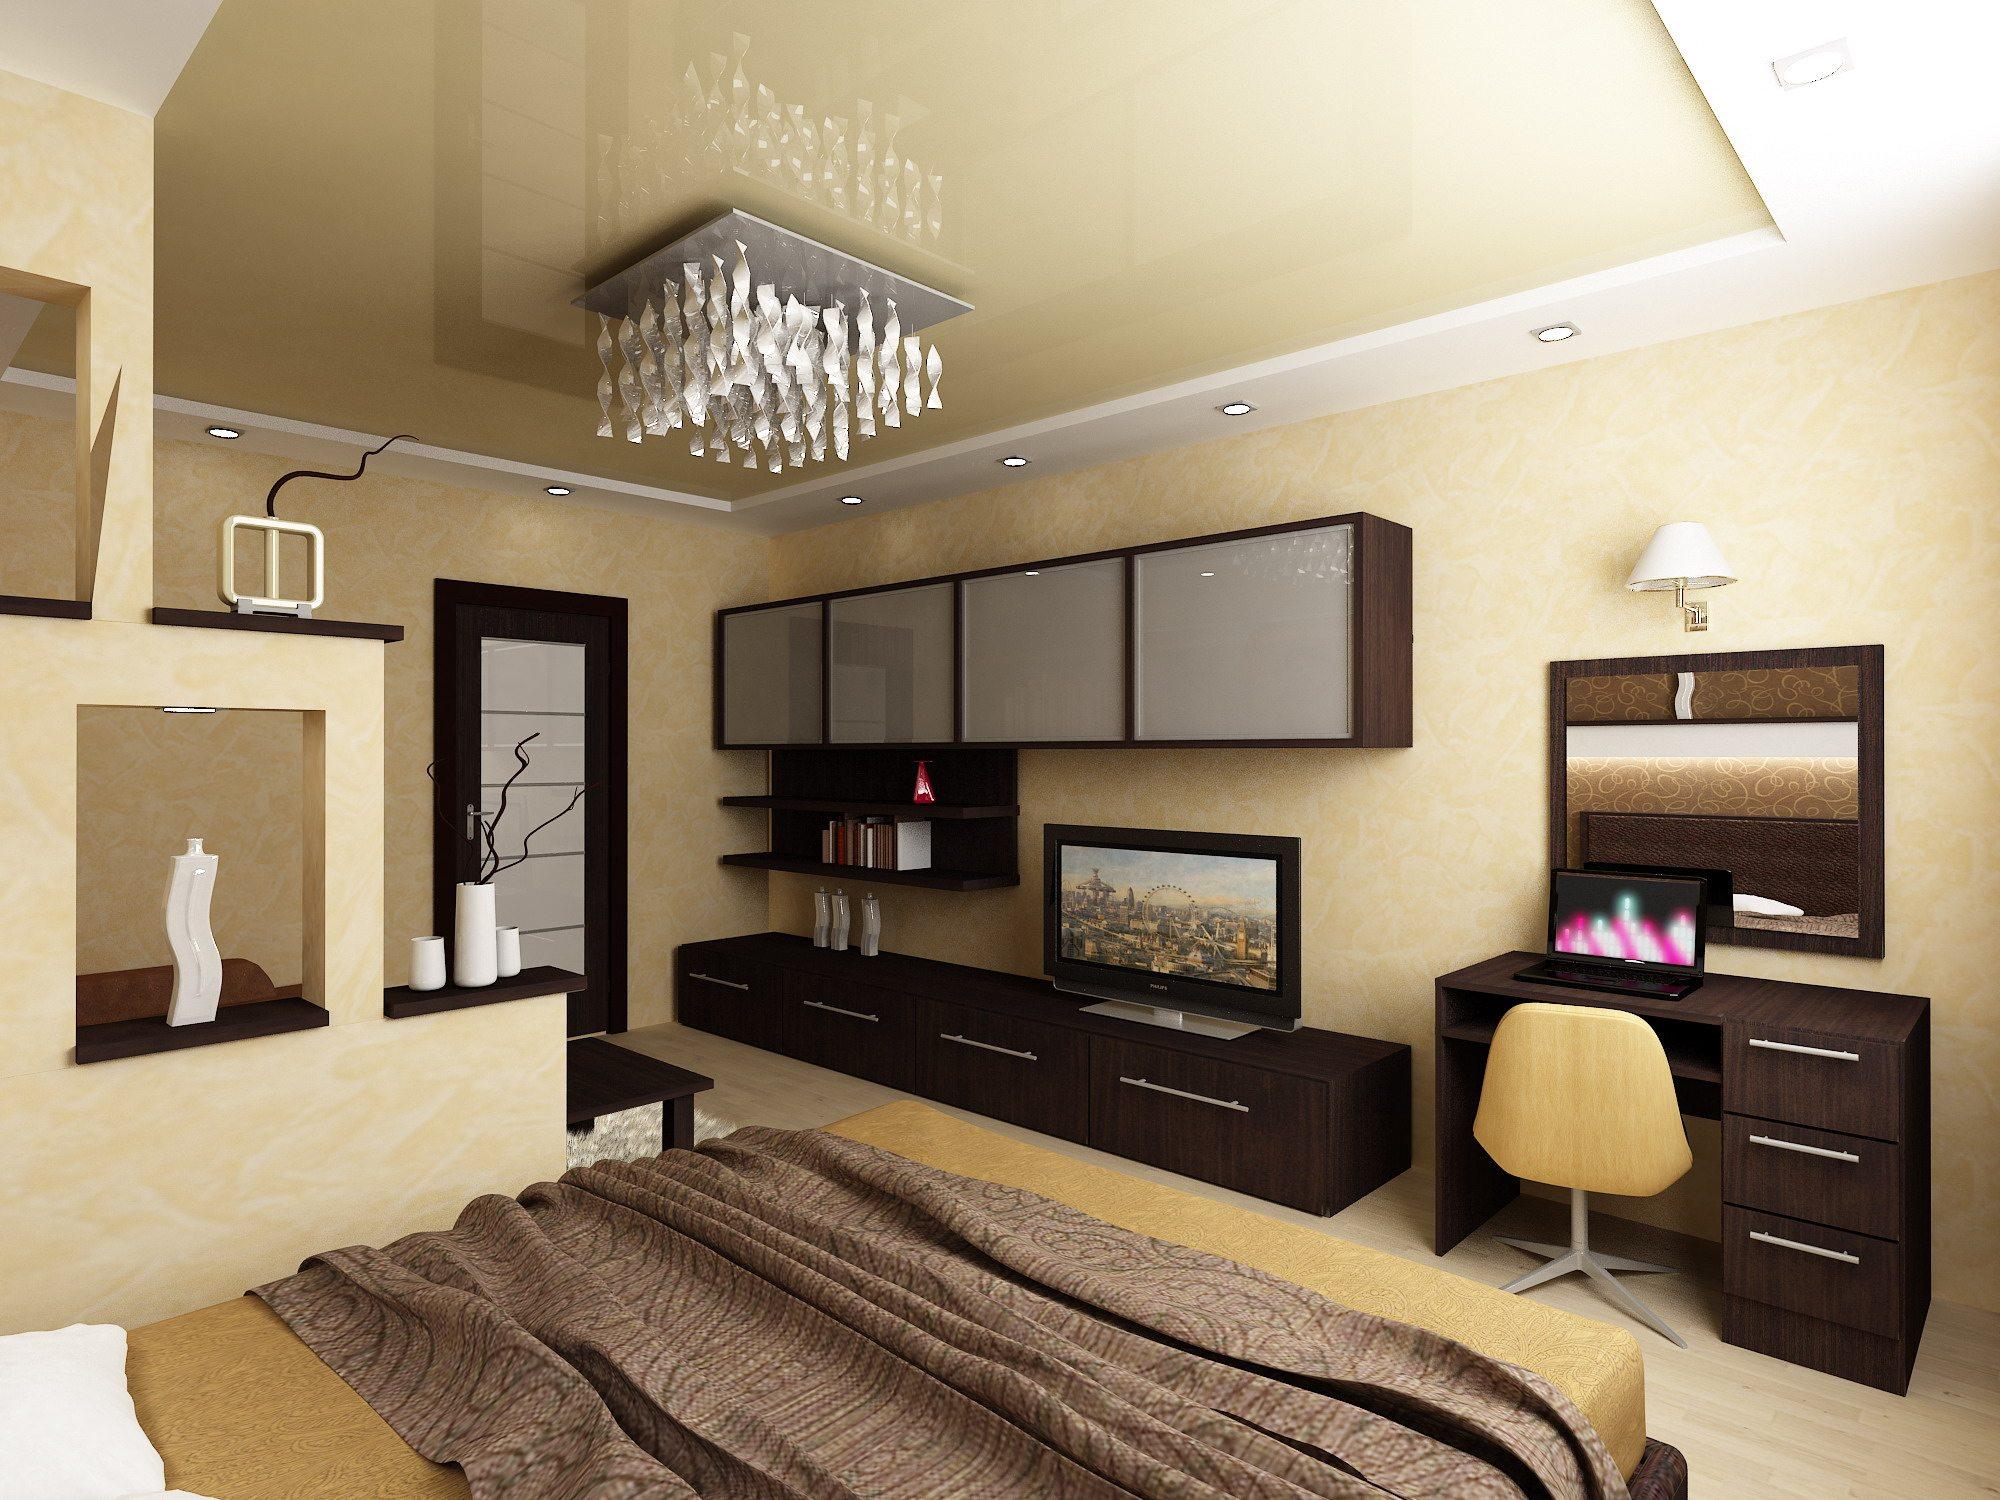 Дизайн в комнате 20 метров